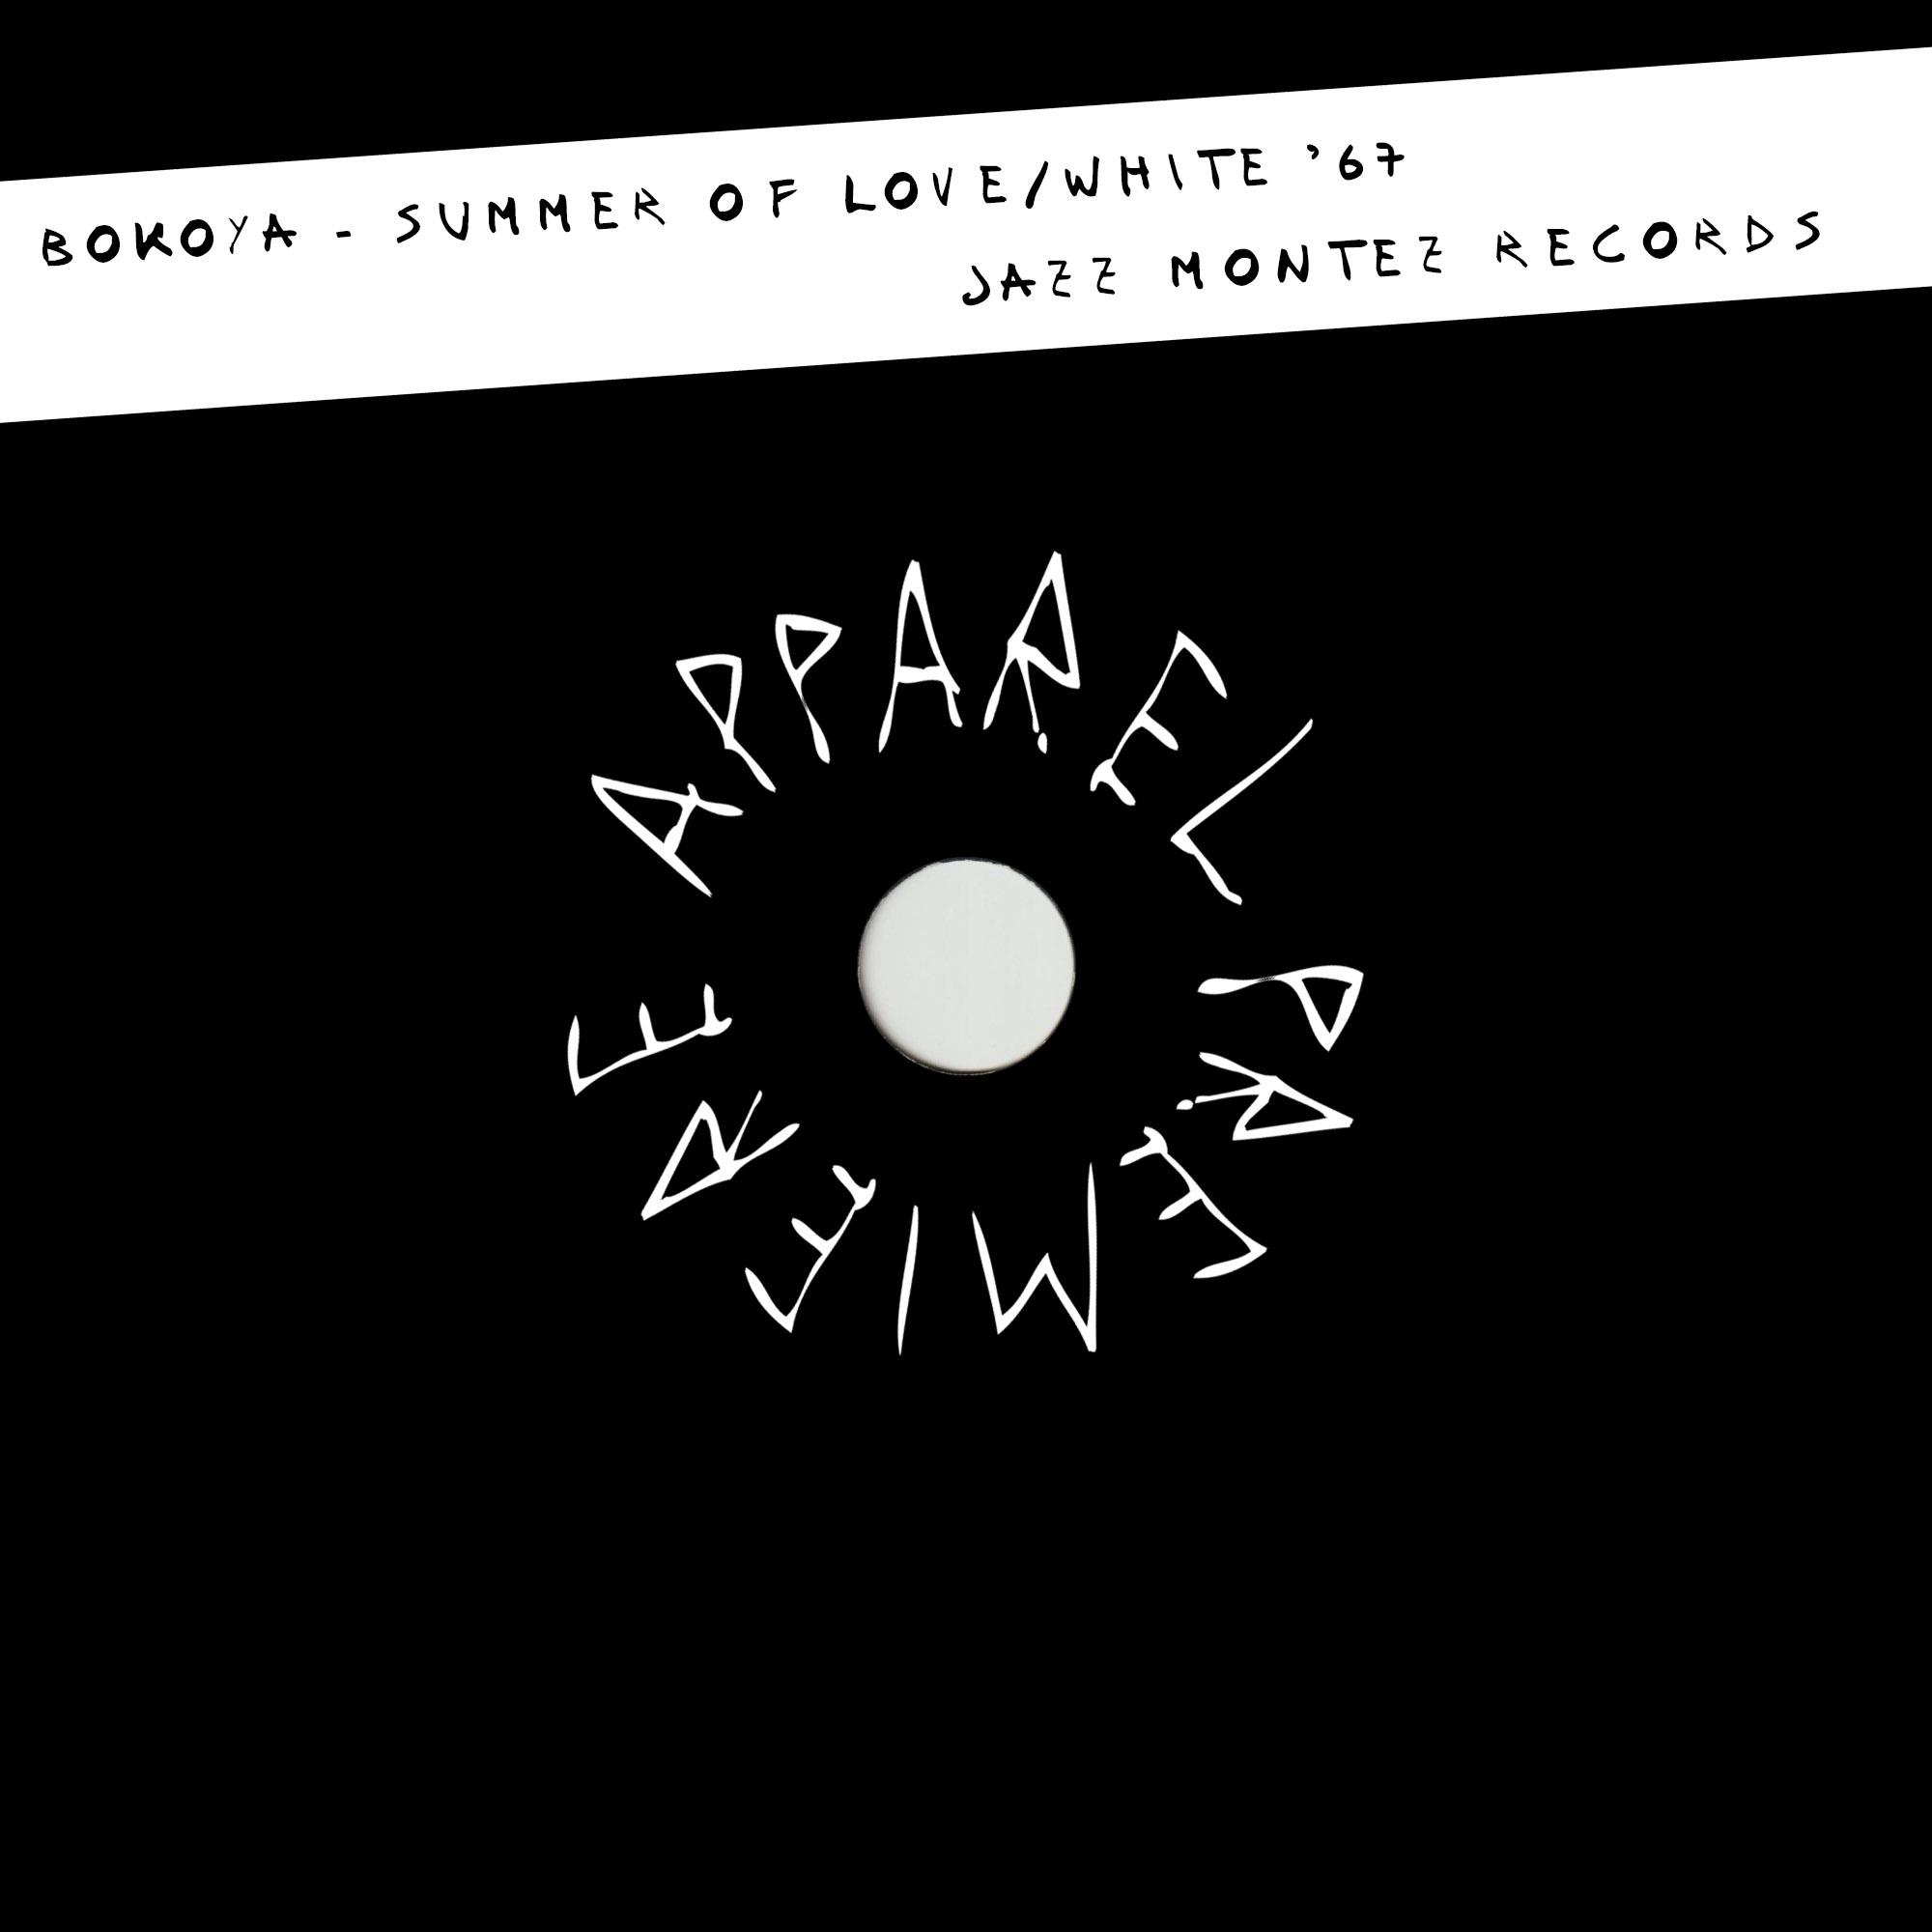 APPAREL PREMIERE: Bokoya – Summer of Love/White '67 [Jazz Montez Records]